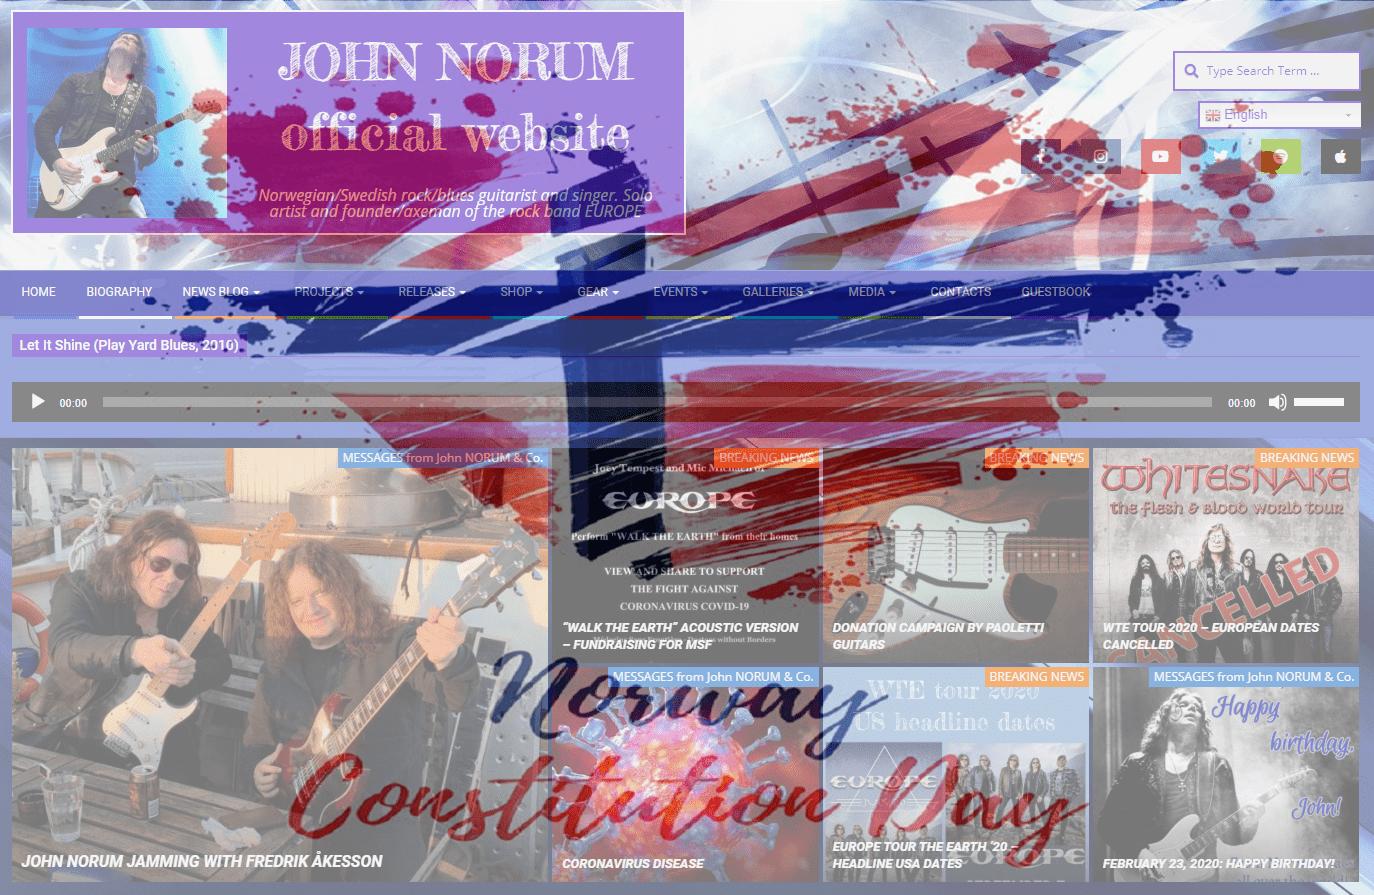 JohnNorum.se 10th Anniversary